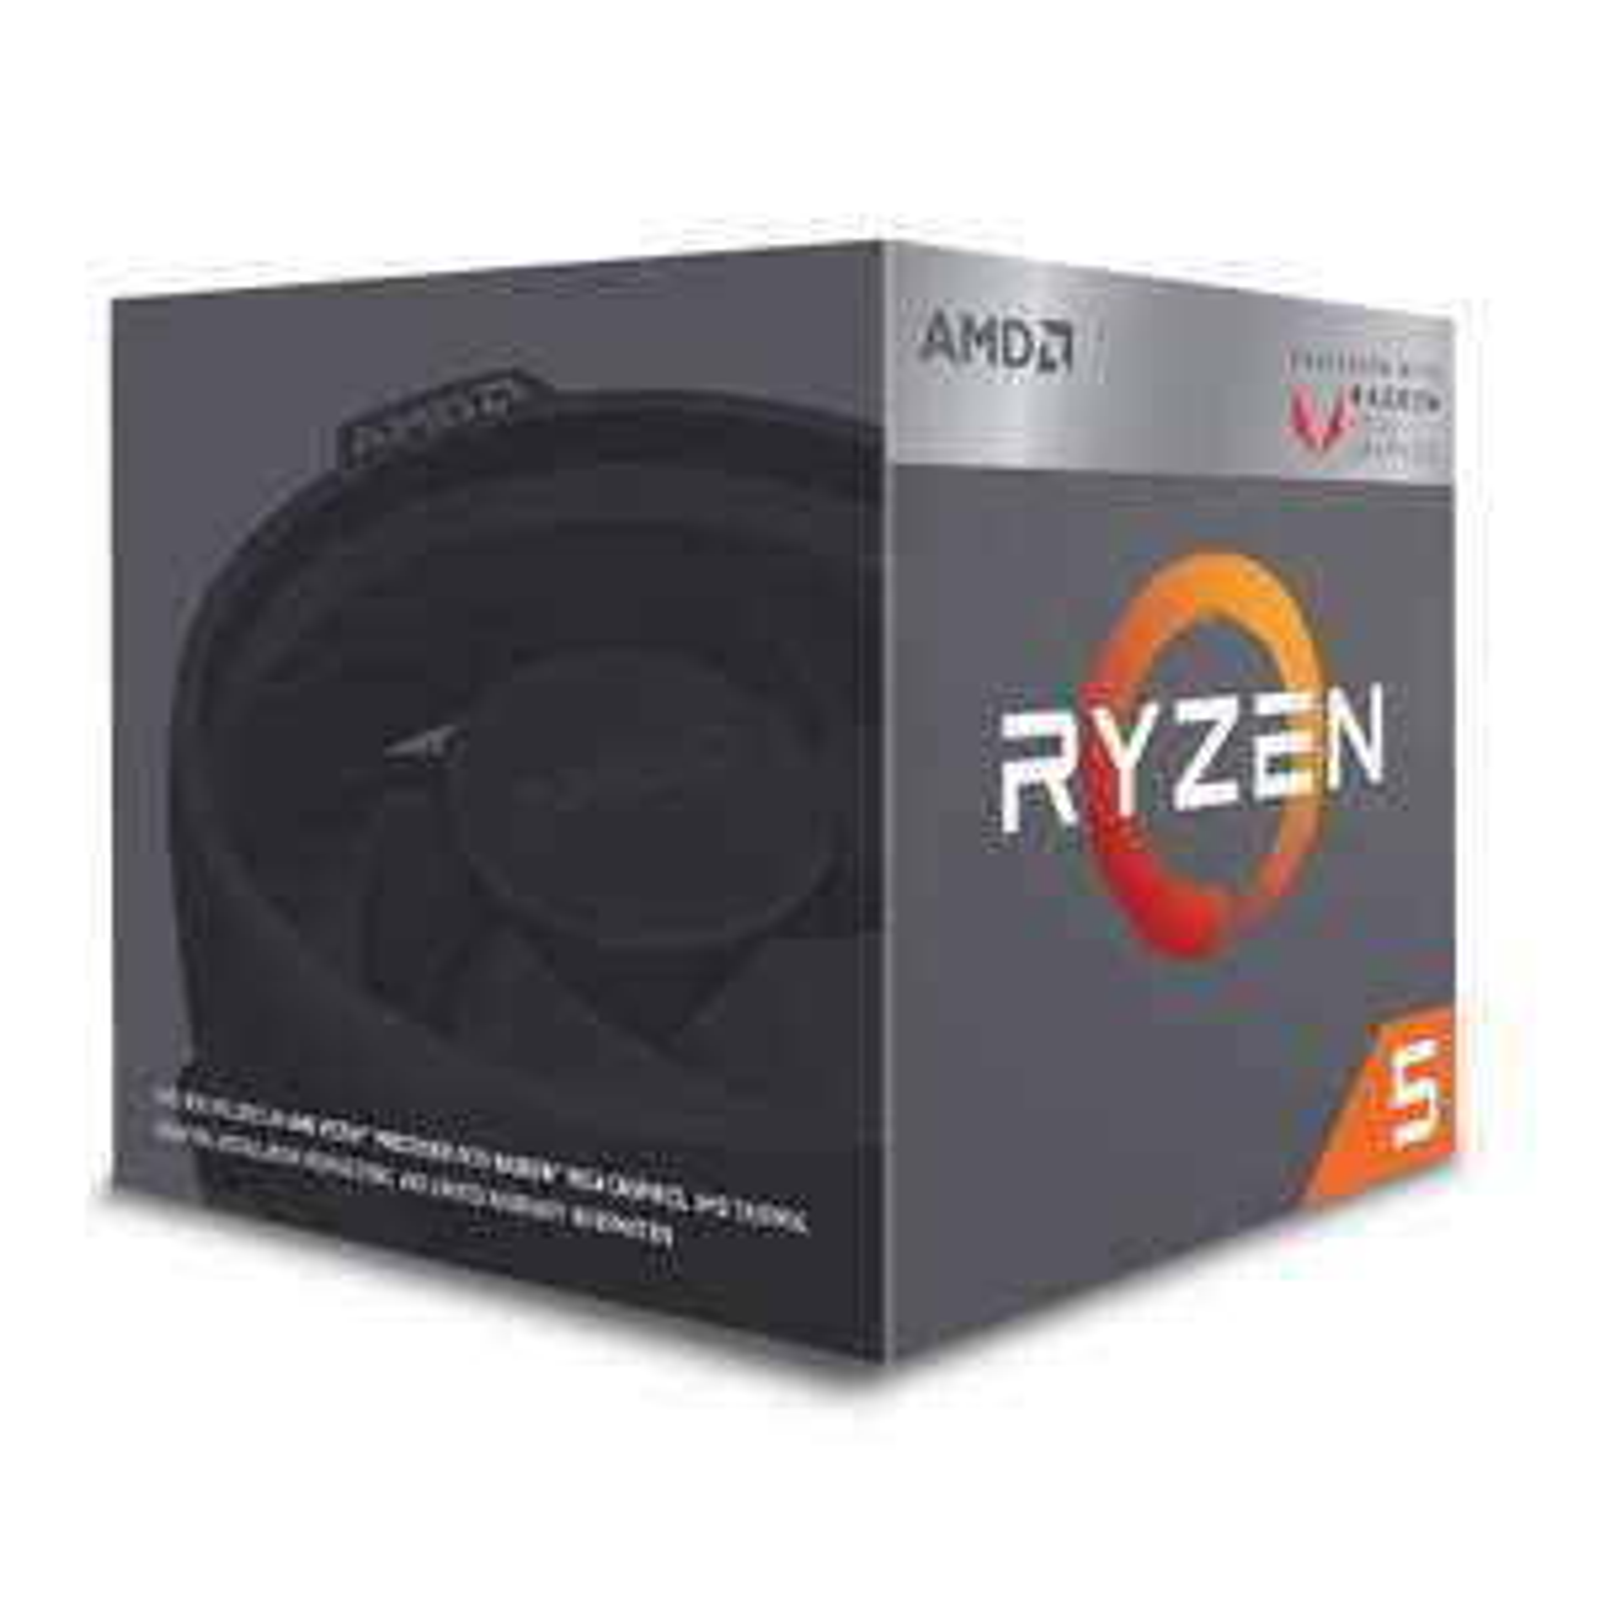 Processeur AMD Ryzen 5 2400G Wraith Stealth Edition (3.6 GHz) + 2 jeux offerts